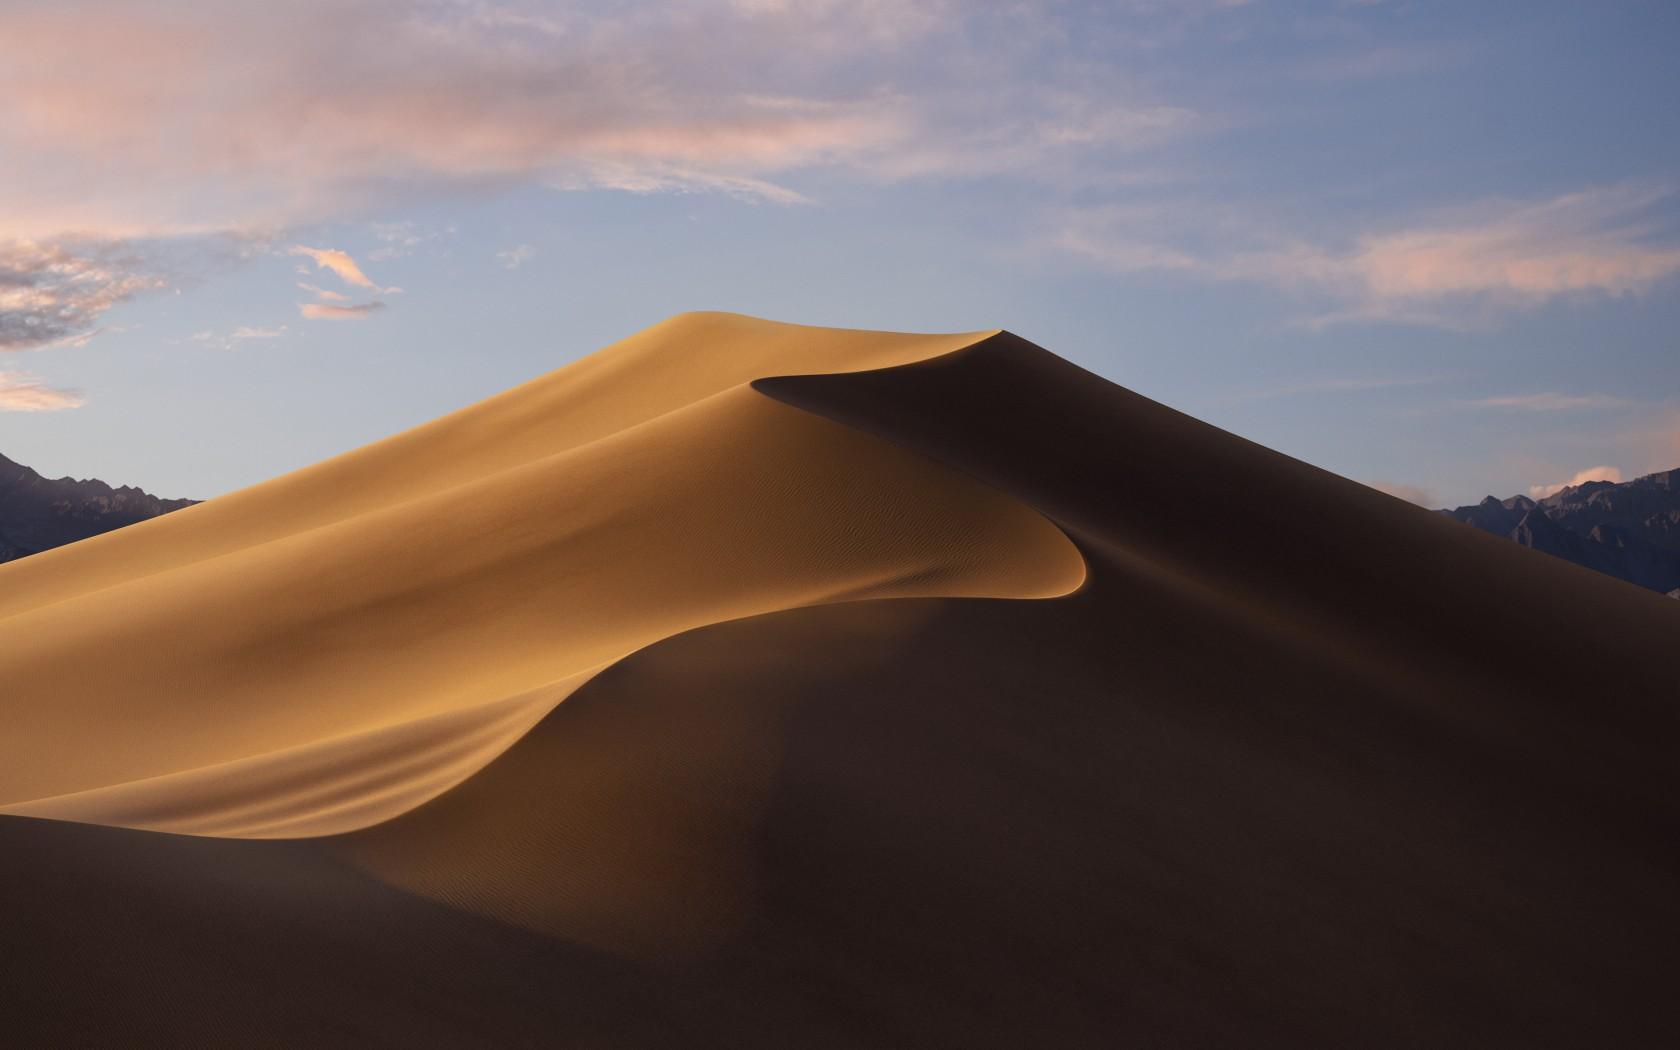 Iphone 5s Stock Wallpaper Macos Mojave Day Desert Stock 5k Wallpapers Hd